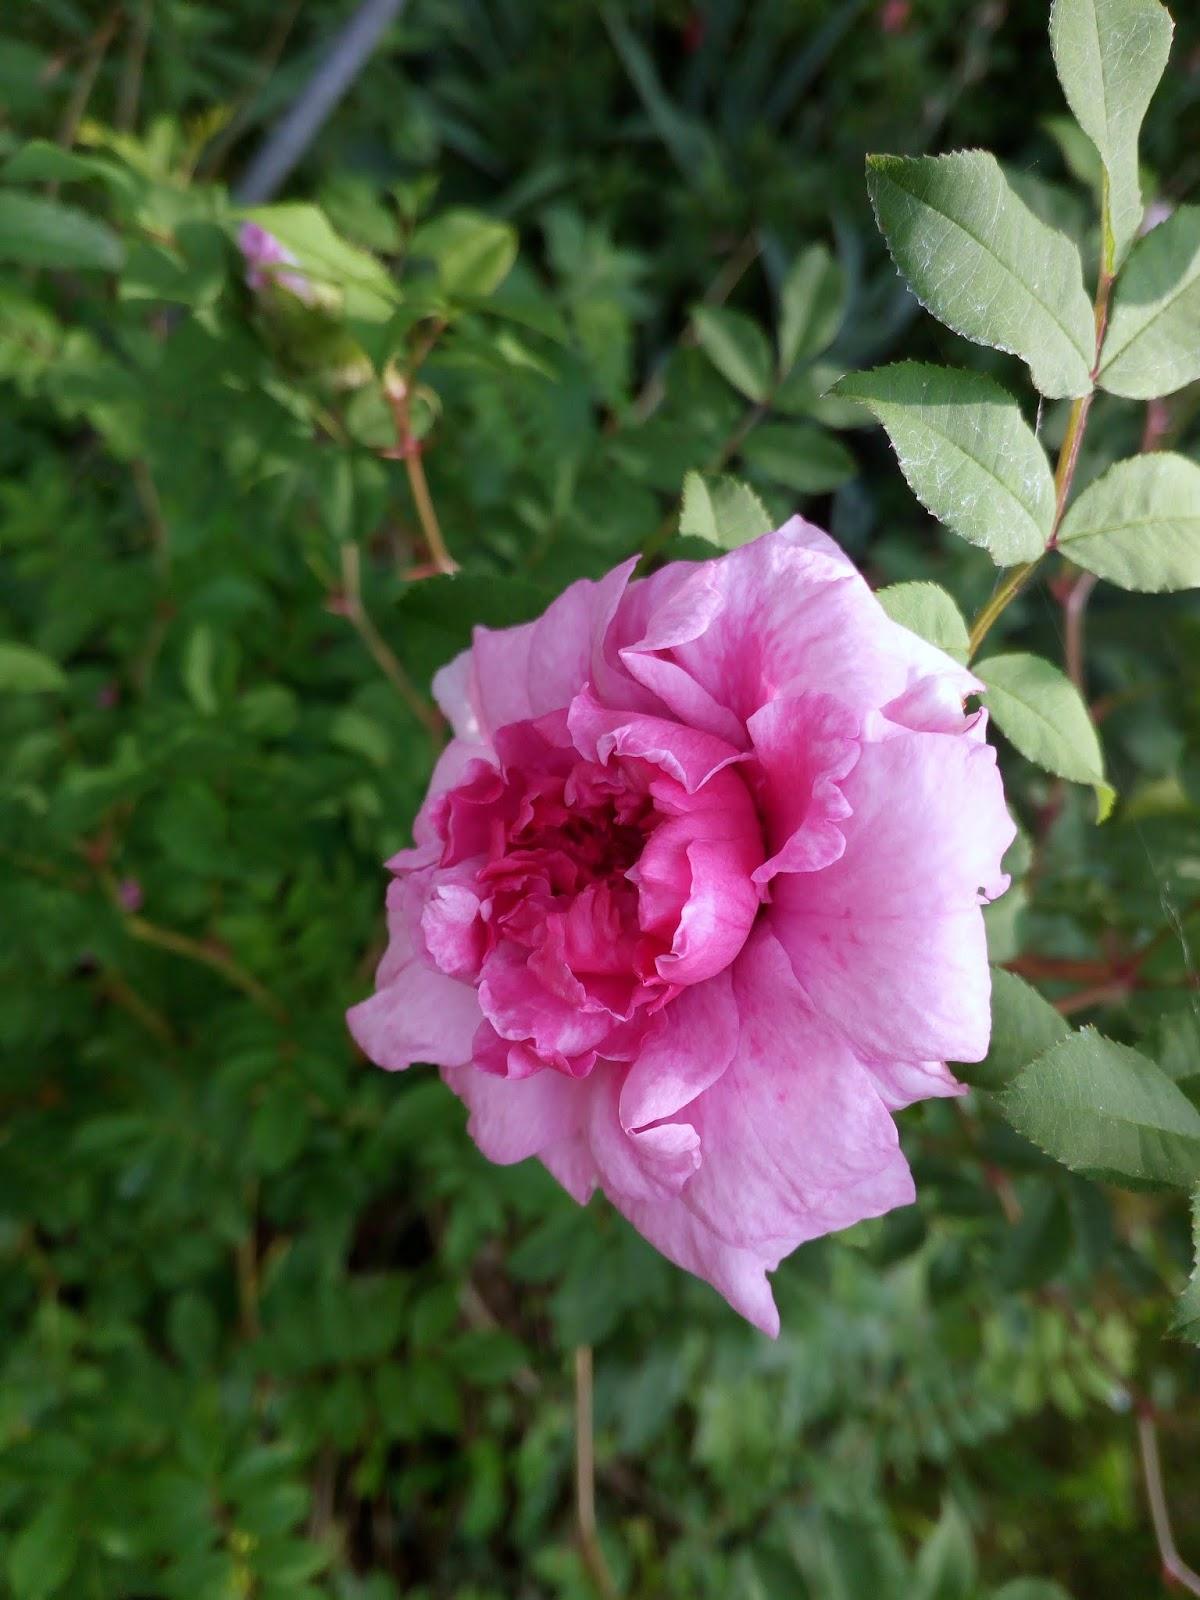 Rose Da Taglio Rifiorenti cucino in giardino: rose ritardatarie